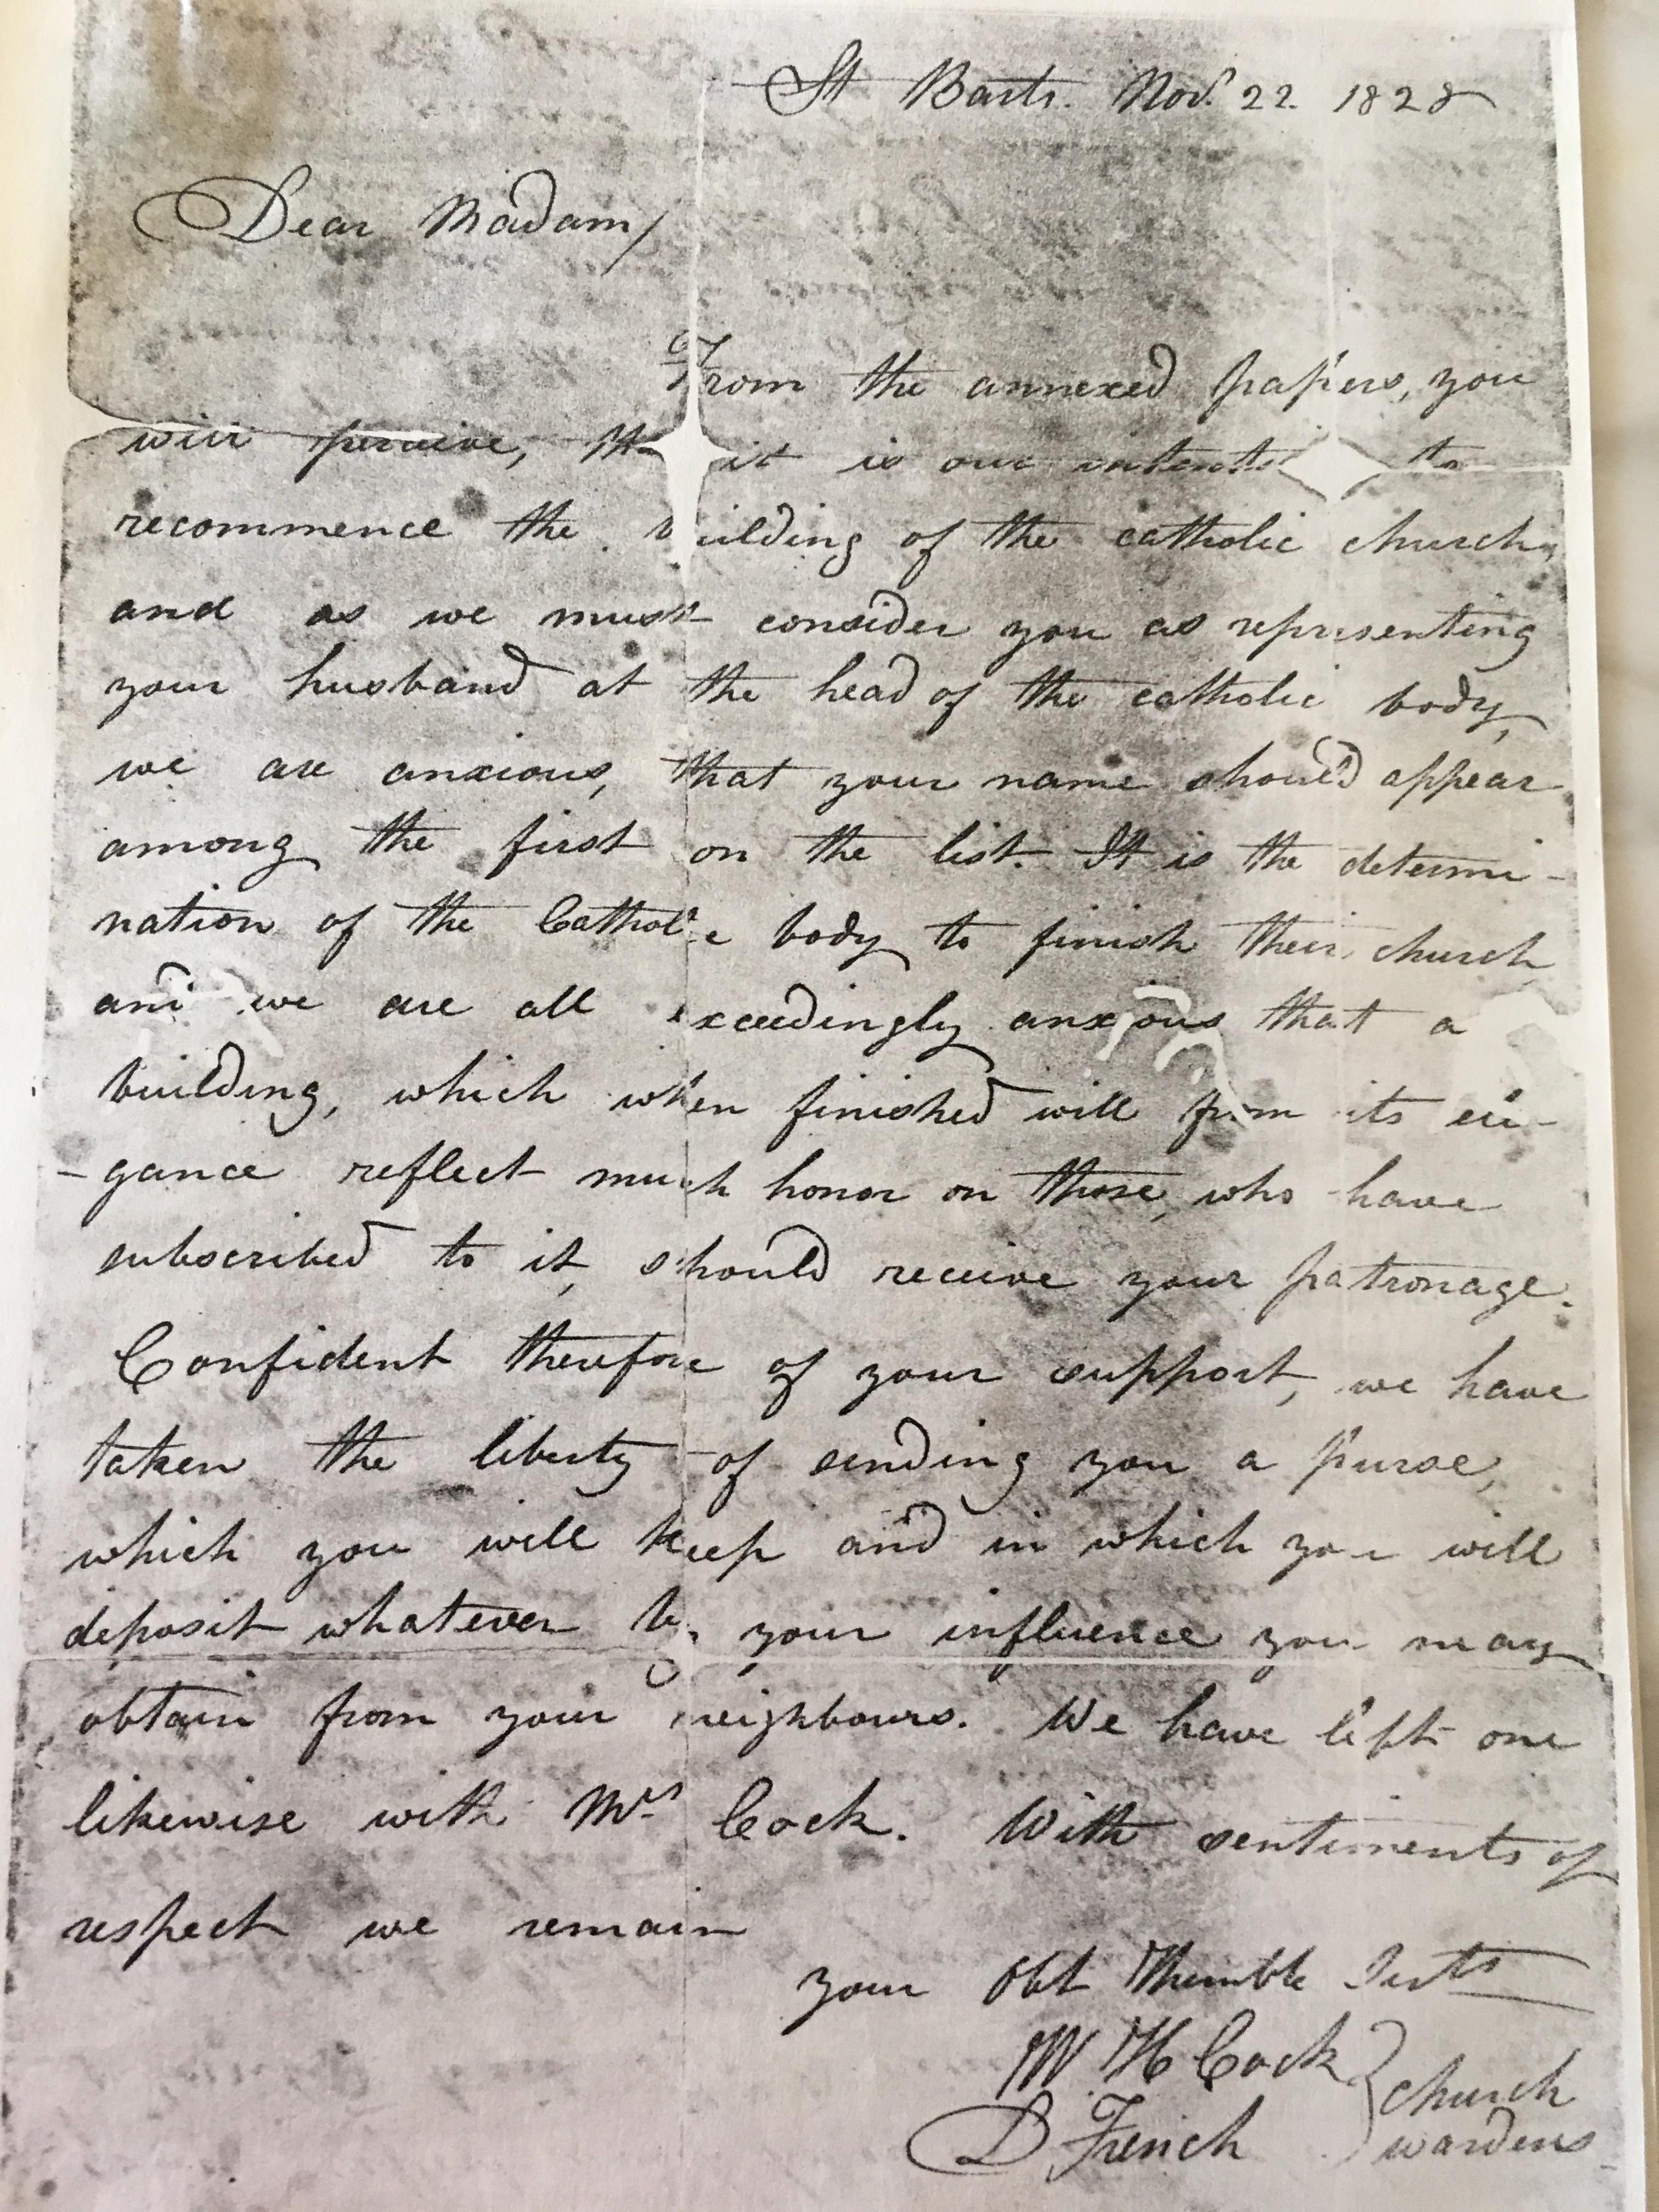 1828 church letter to Eizabeth WARNER-PORTELLY p 2